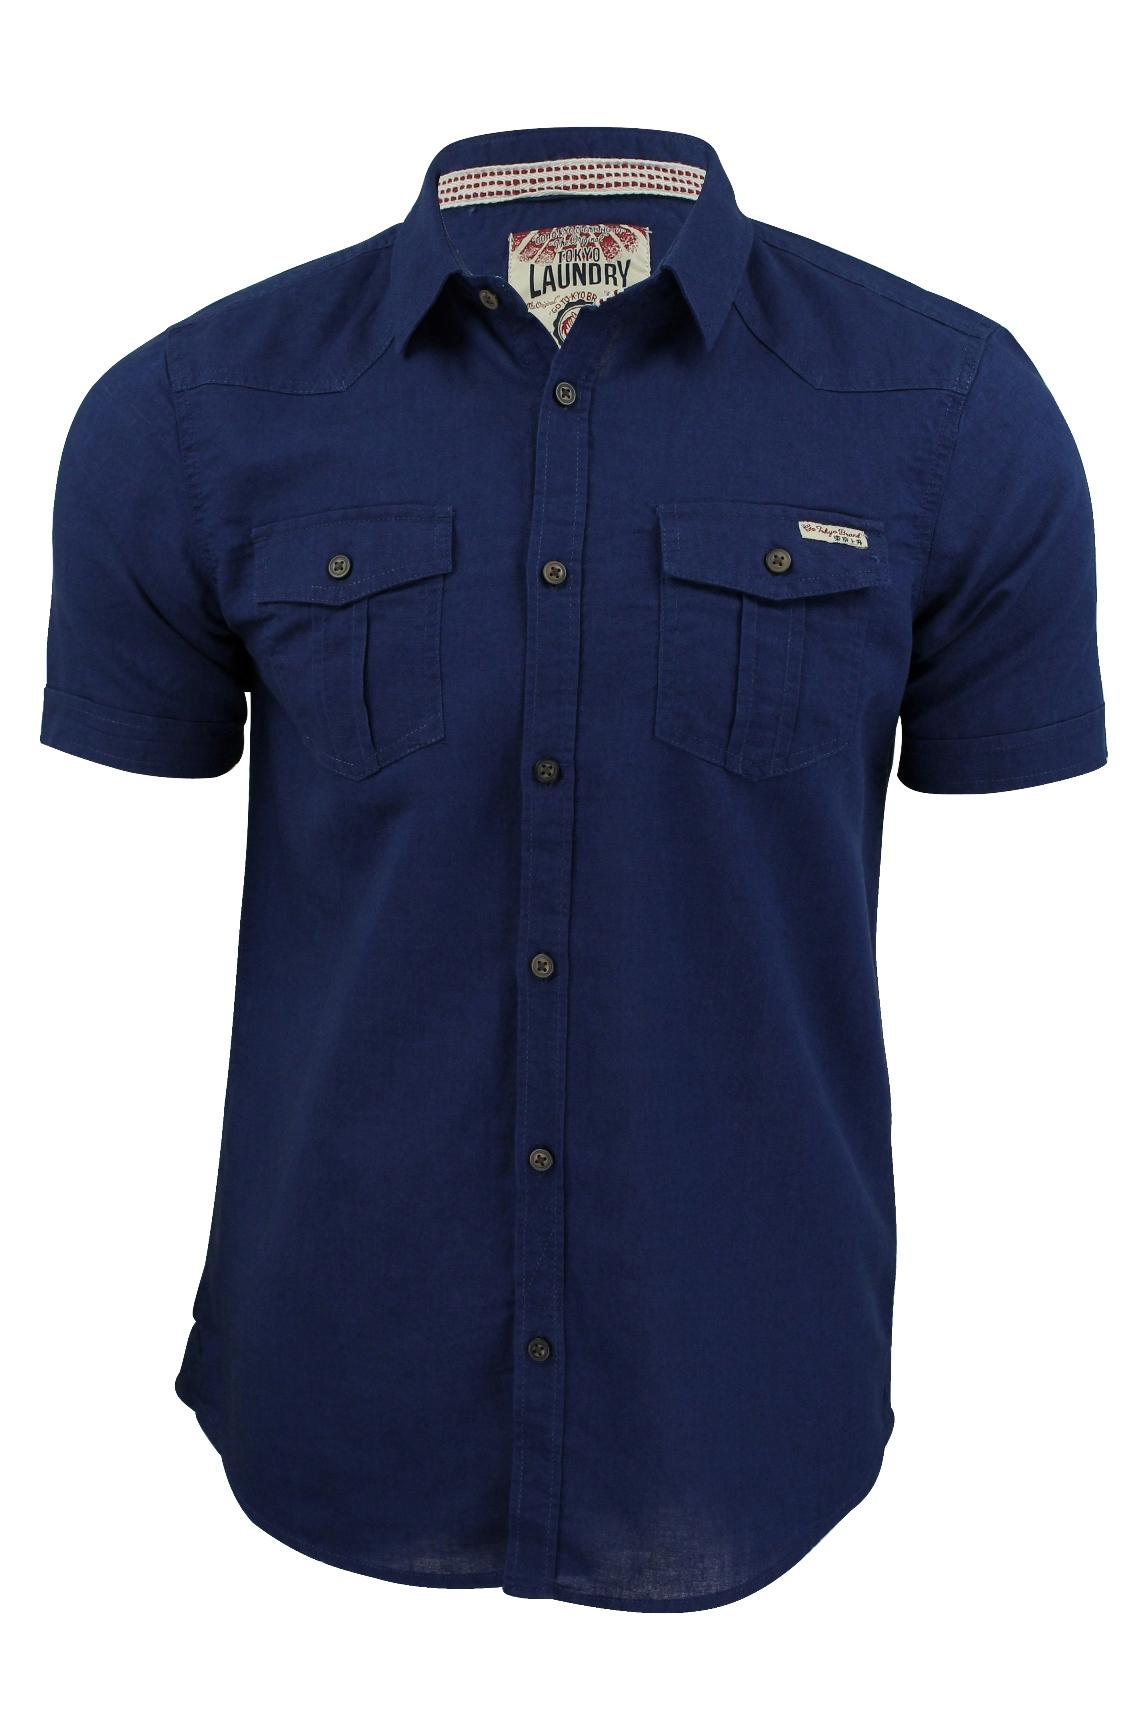 Mens shirt tokyo laundry 39 rosso 39 linen cotton short for Mens summer linen shirts